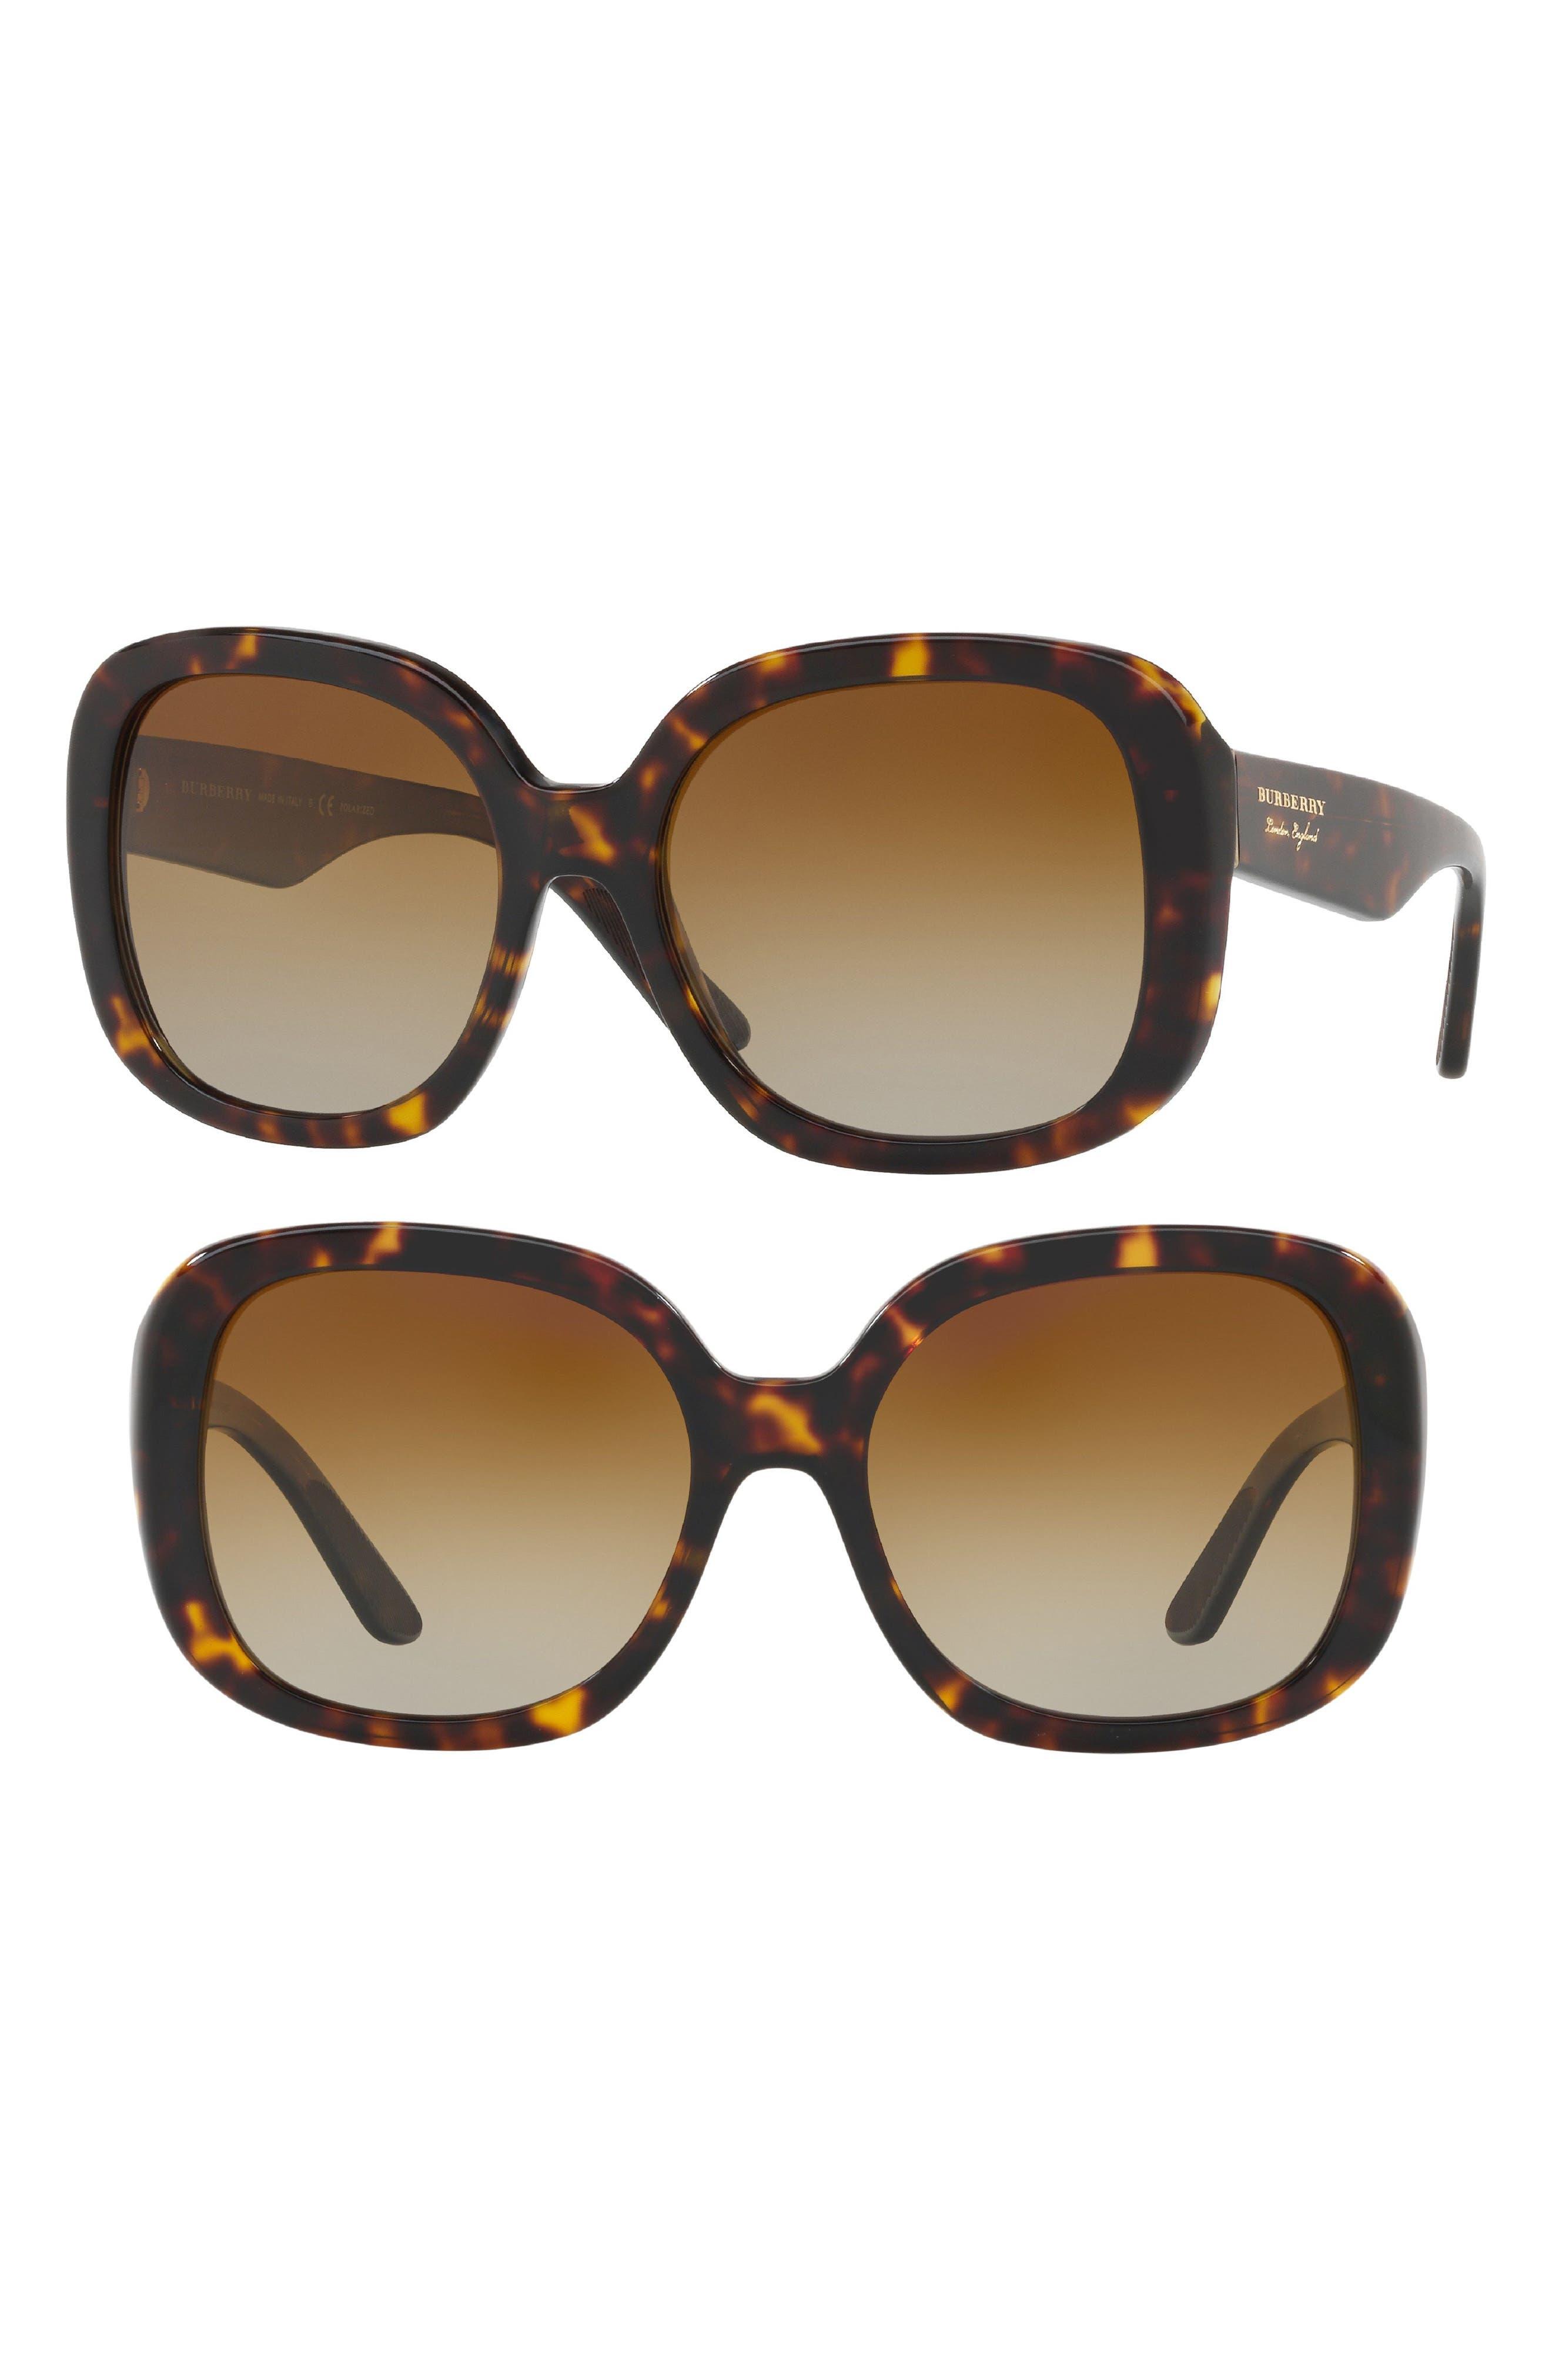 56mm Polarized Sunglasses,                         Main,                         color, 200